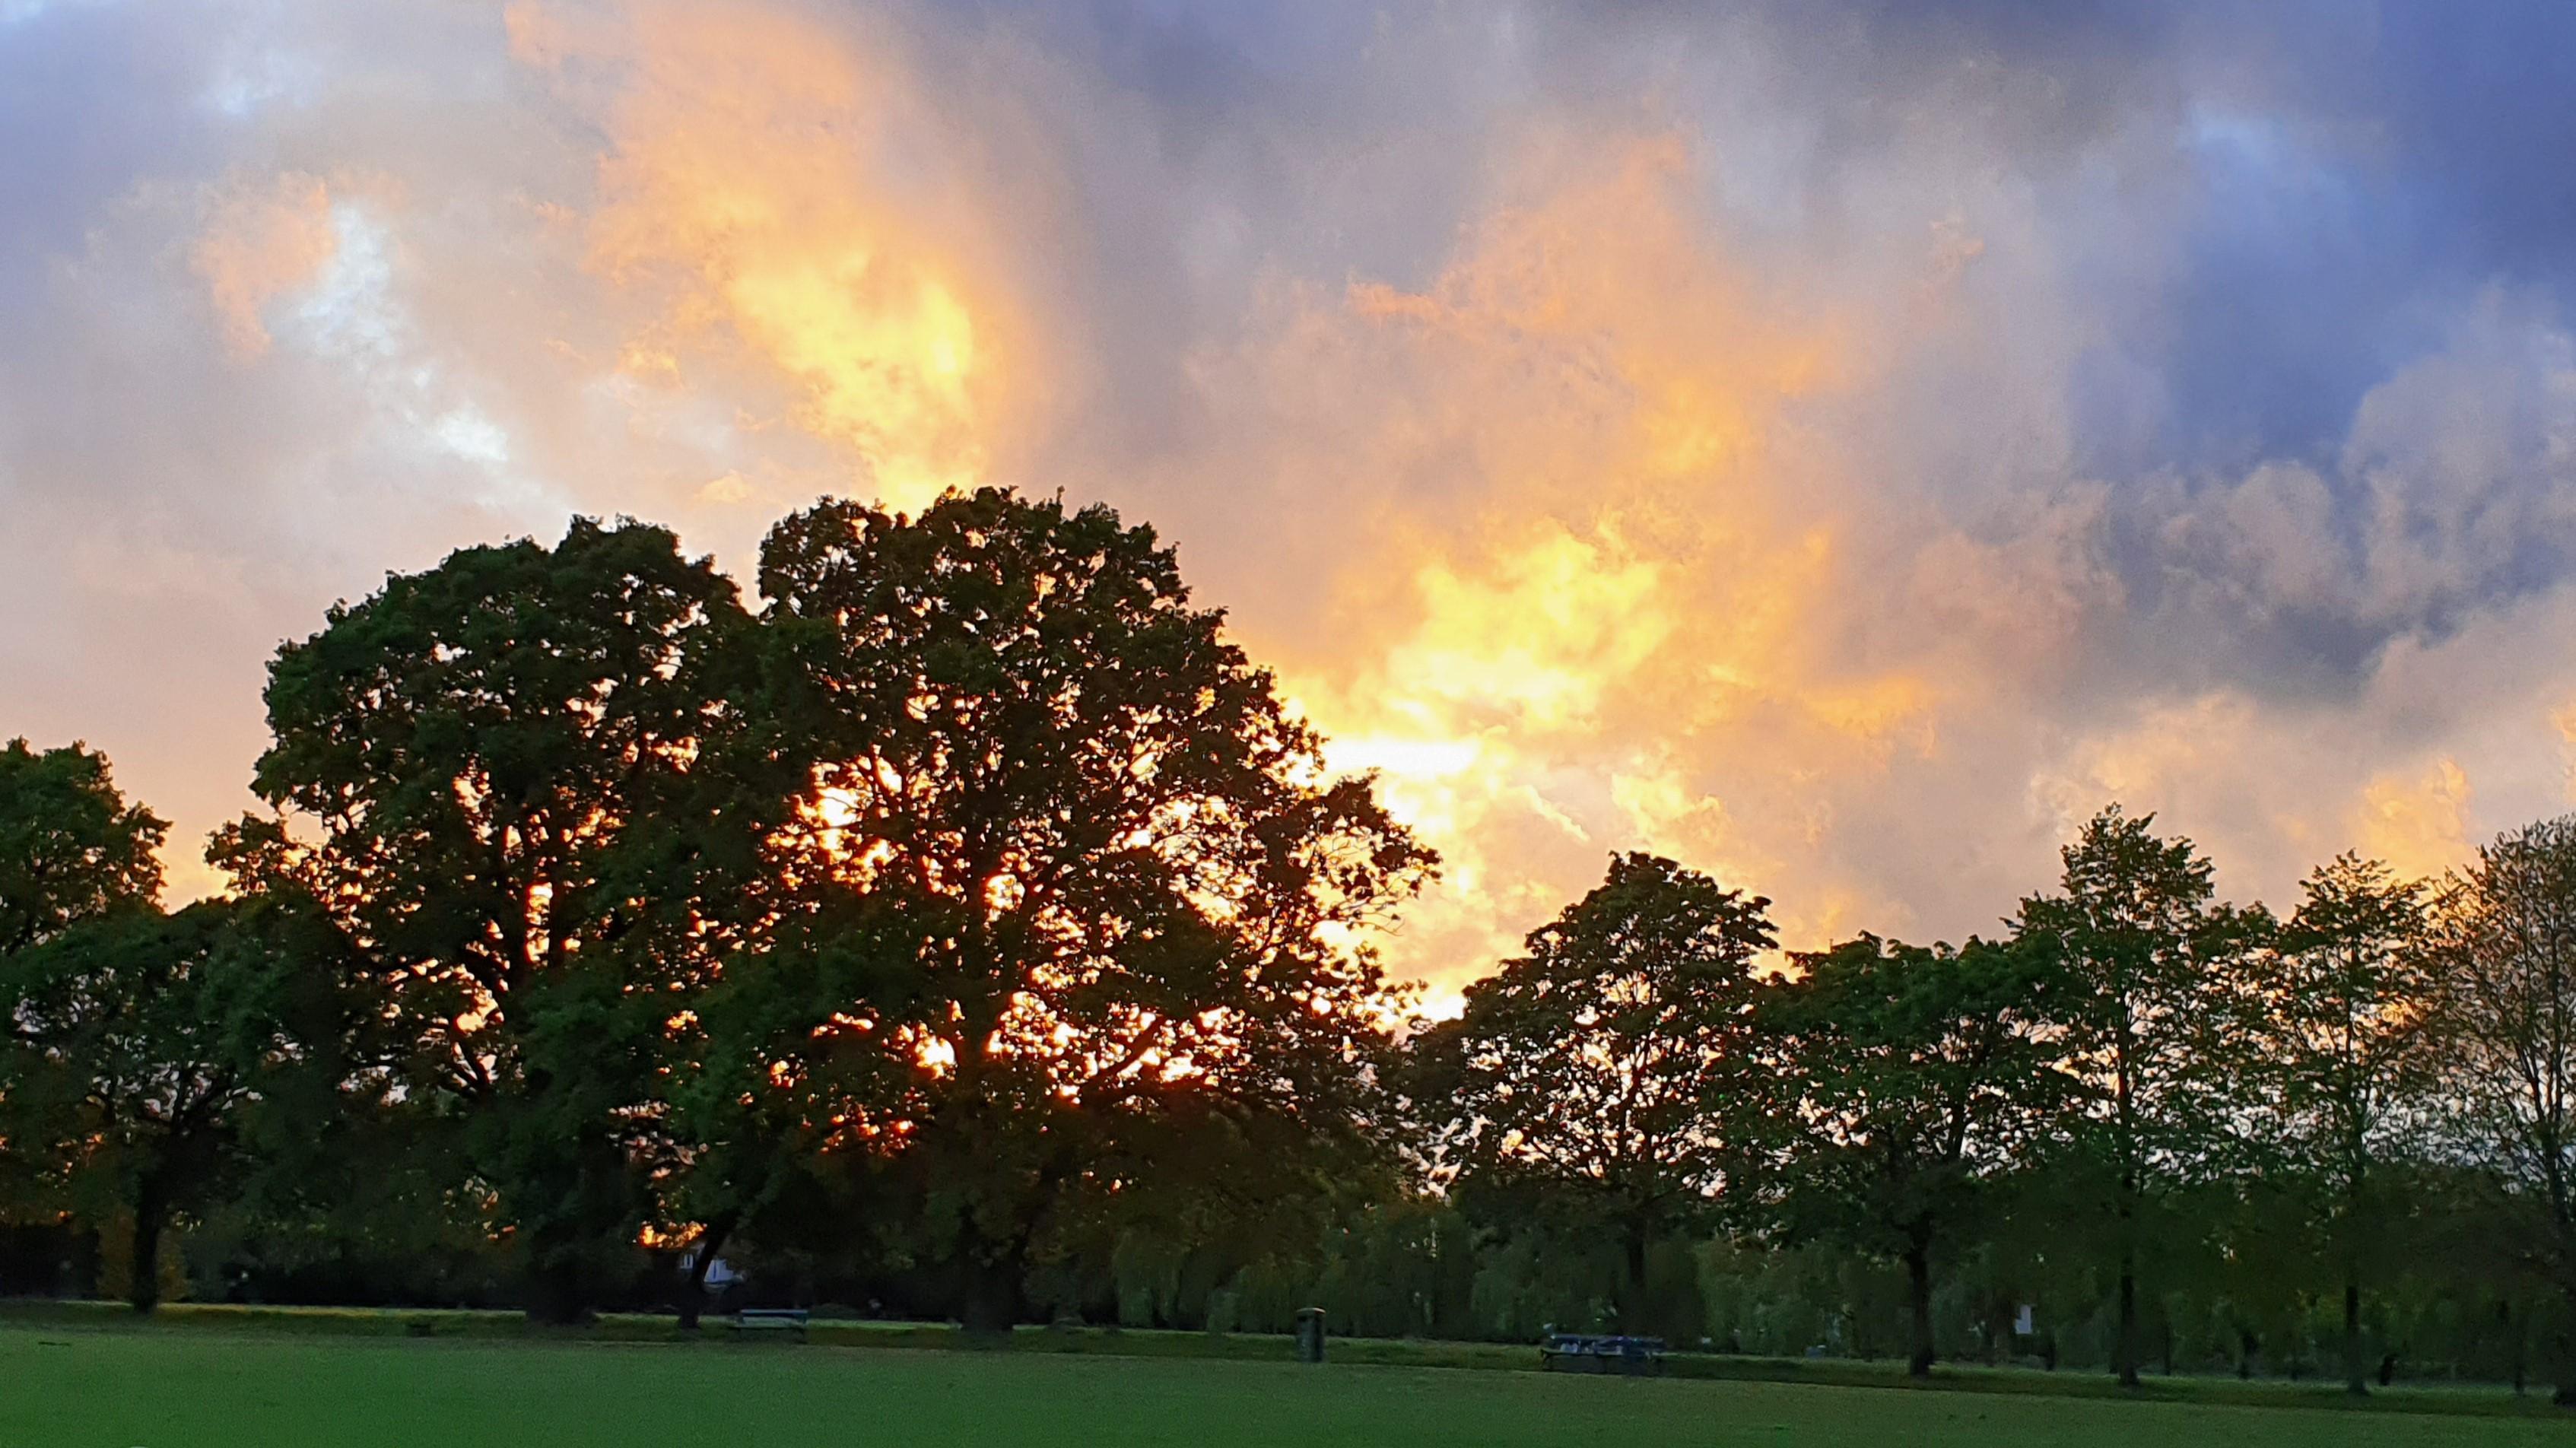 sunset in harold wood park